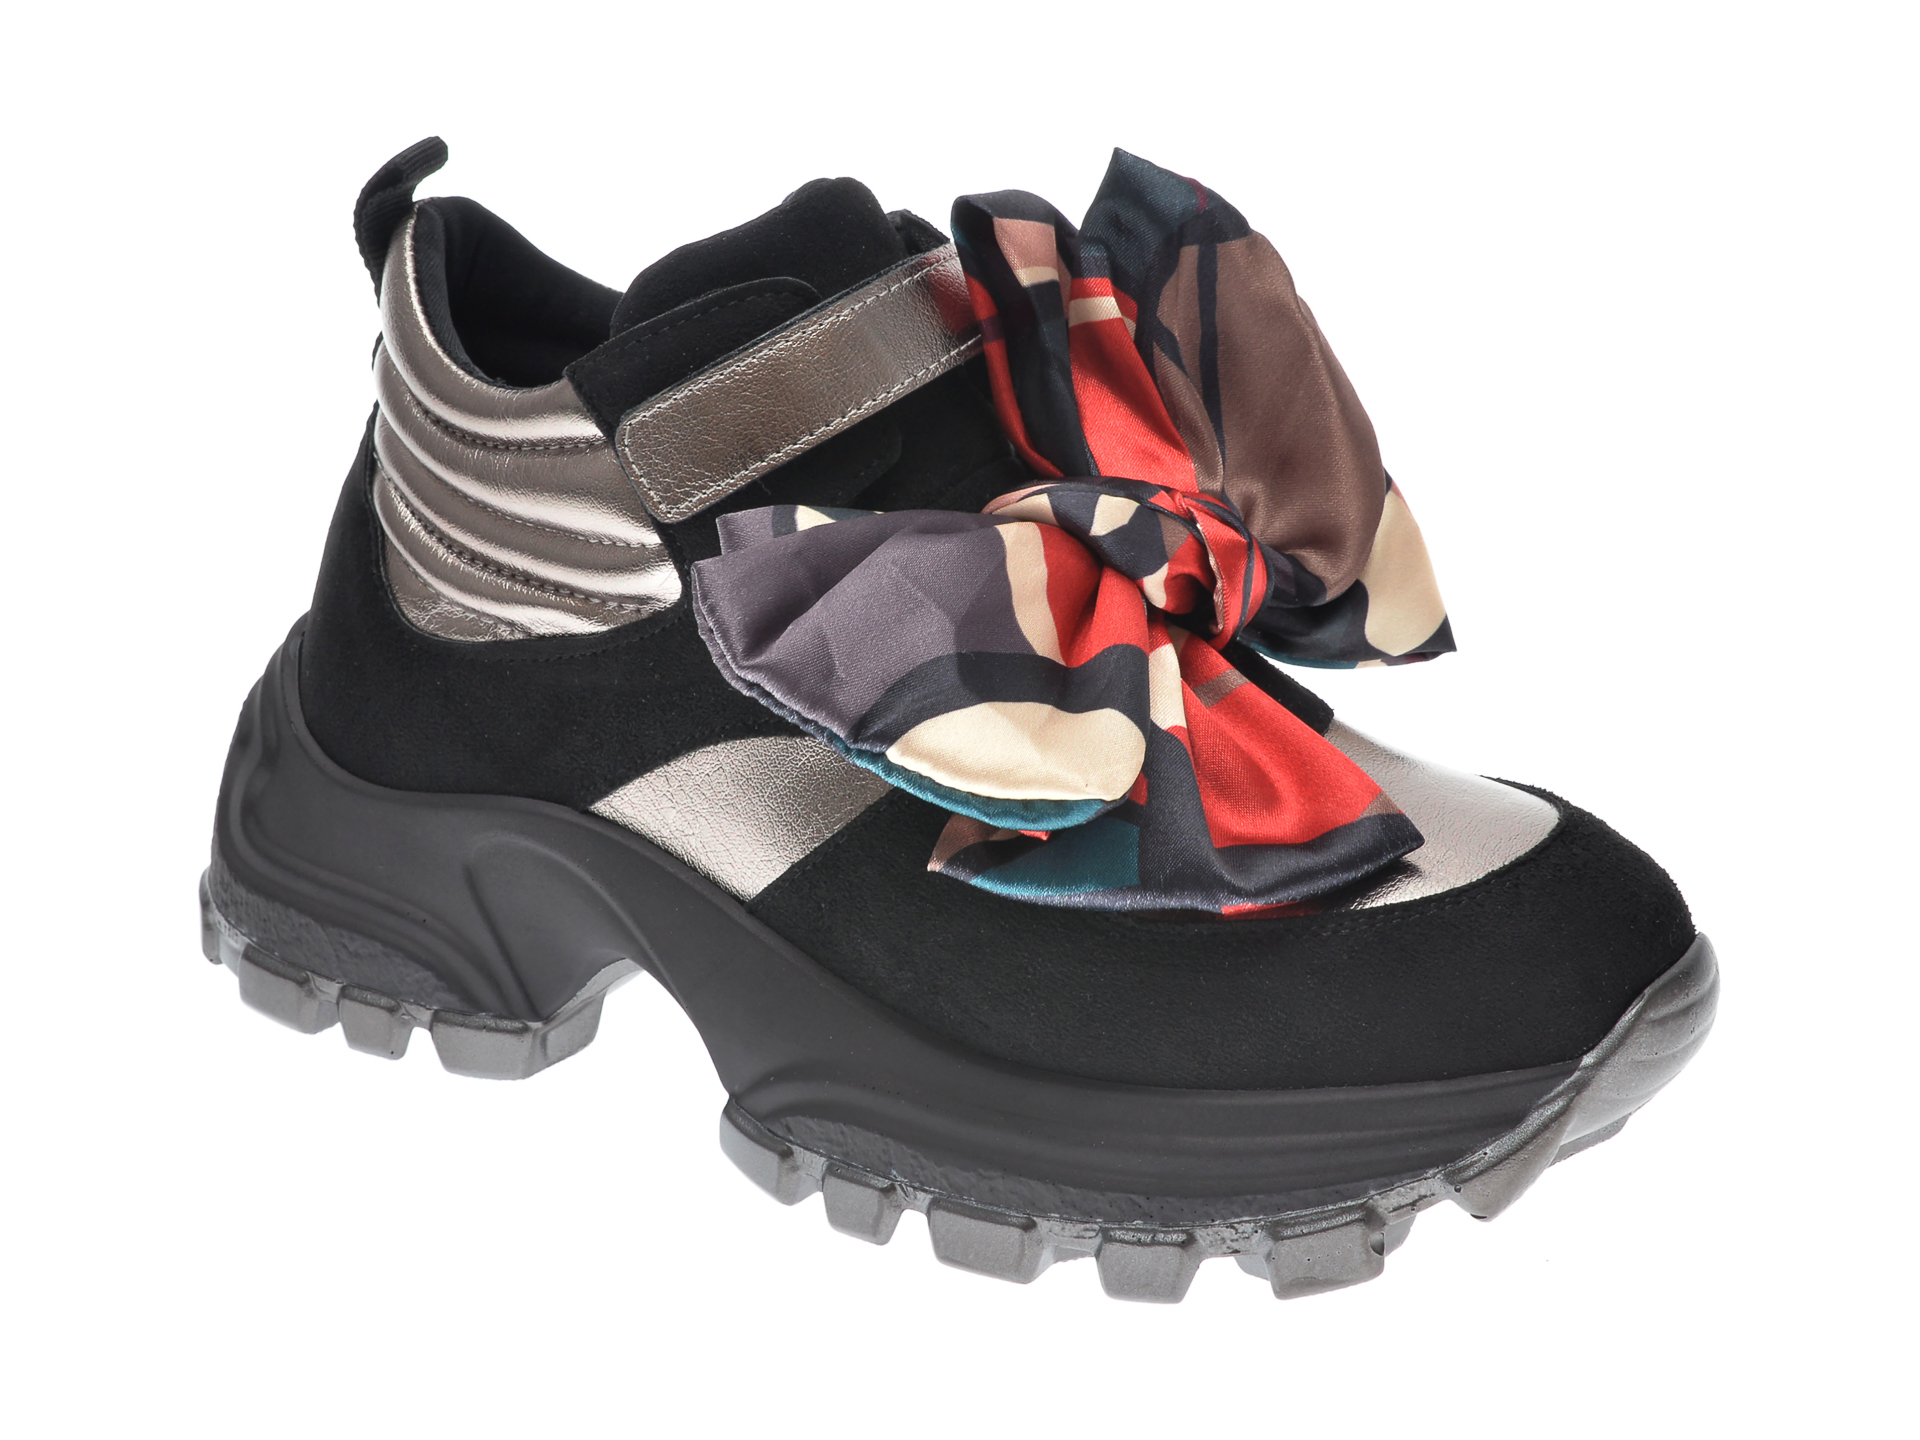 Pantofi Sport Gryxx Negri, Mo12454, Din Material Textil Si Piele Ecologica